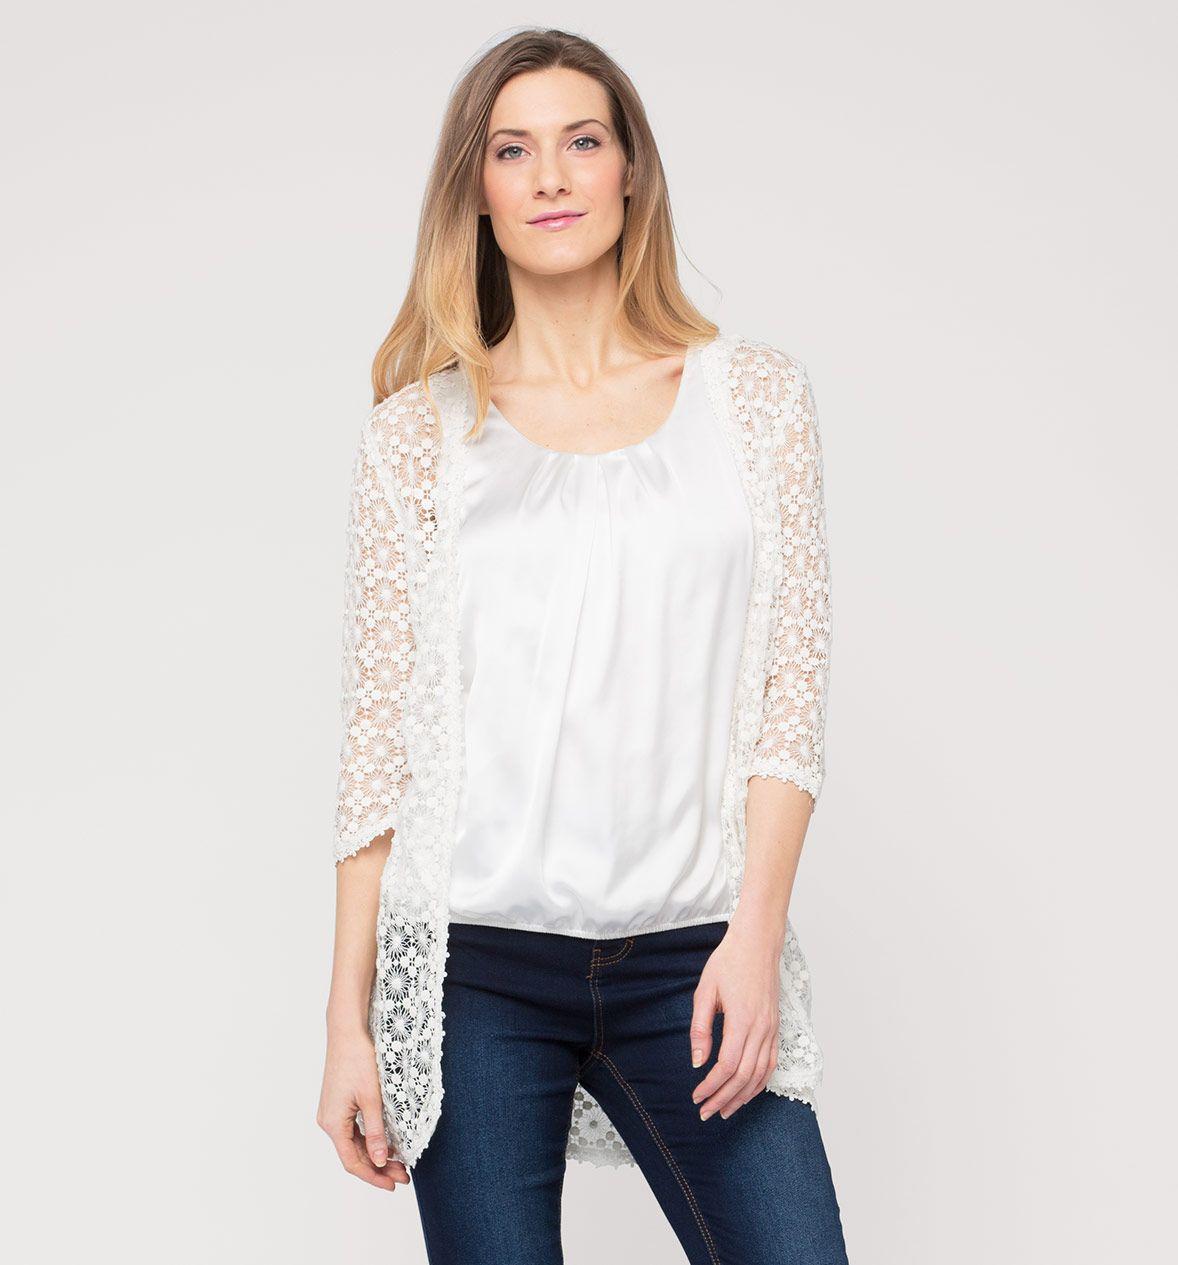 Damen Jacke Aus Spitze In Weiss Mode Gunstig Online Kaufen C A Mode Dameskleding Tops